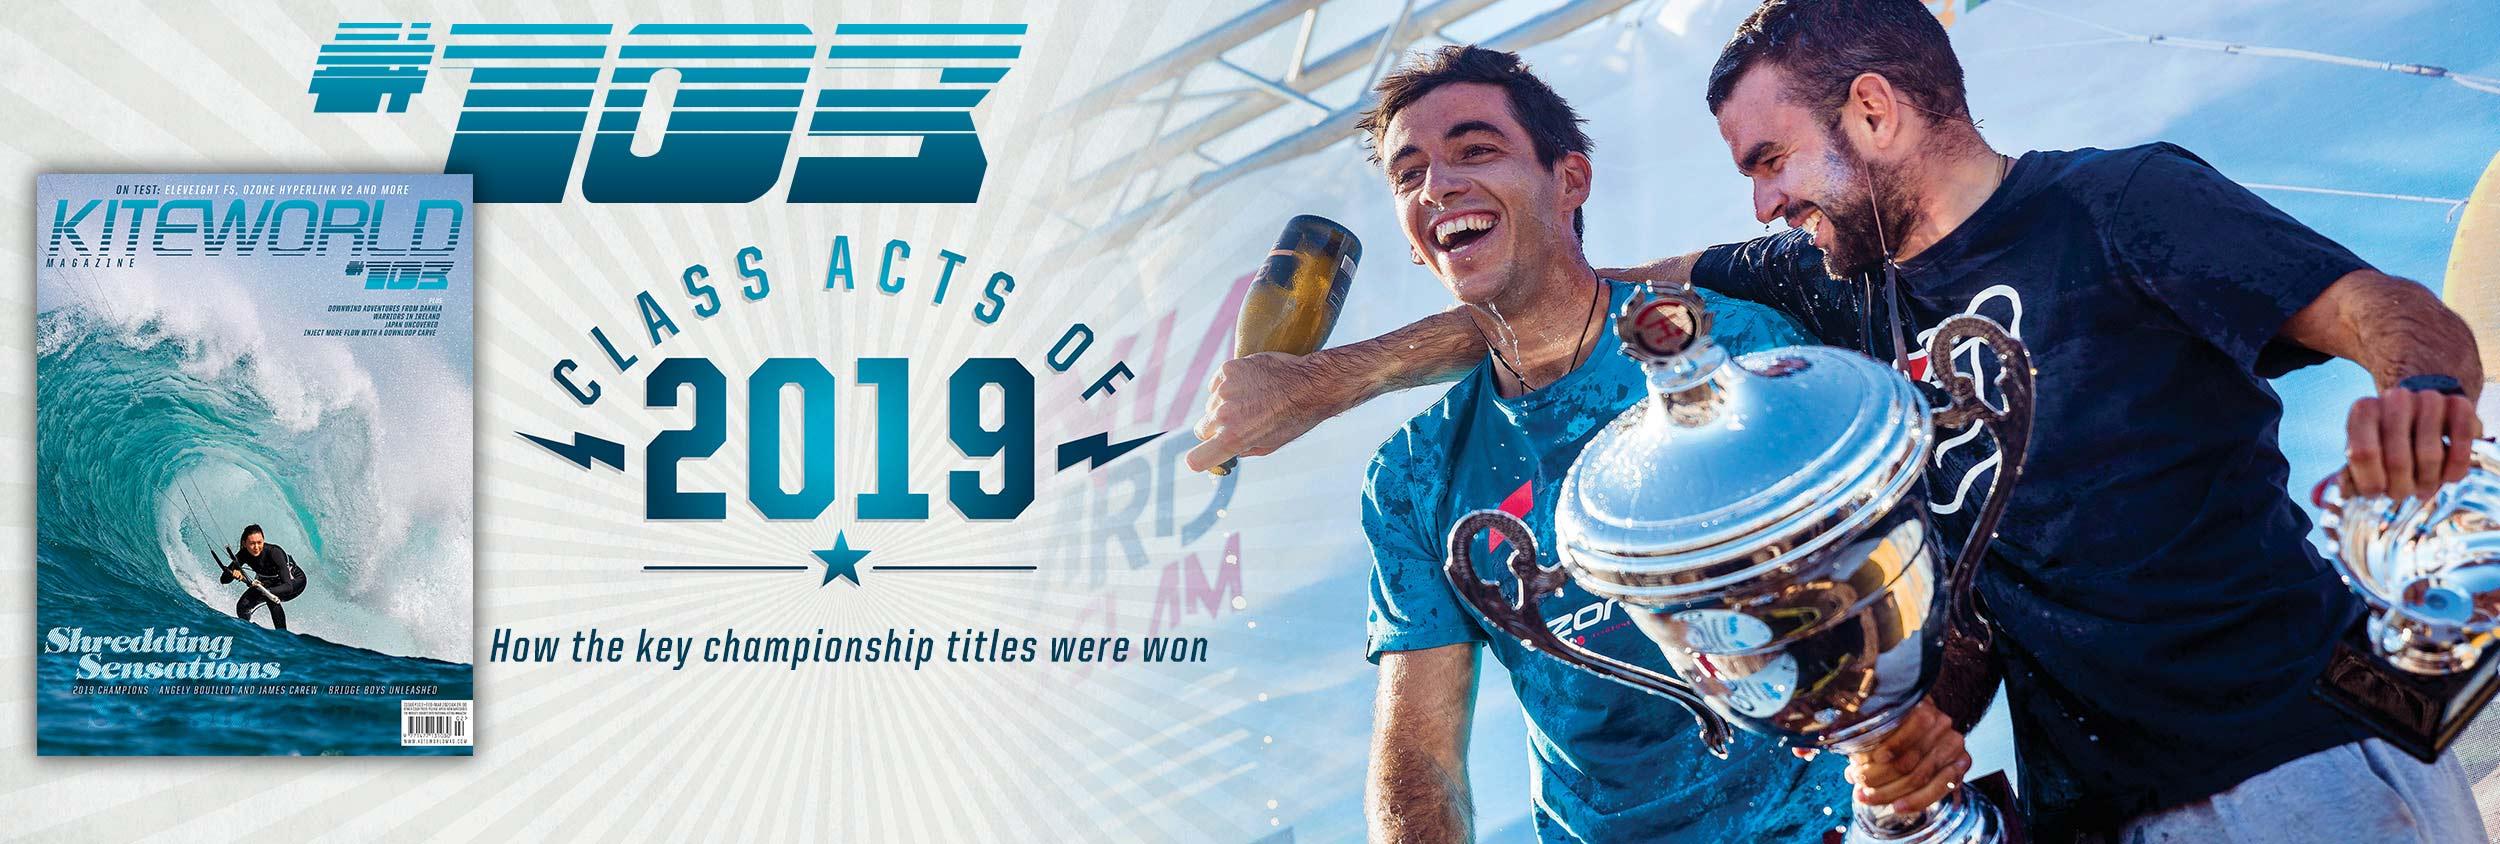 Kite racing champions